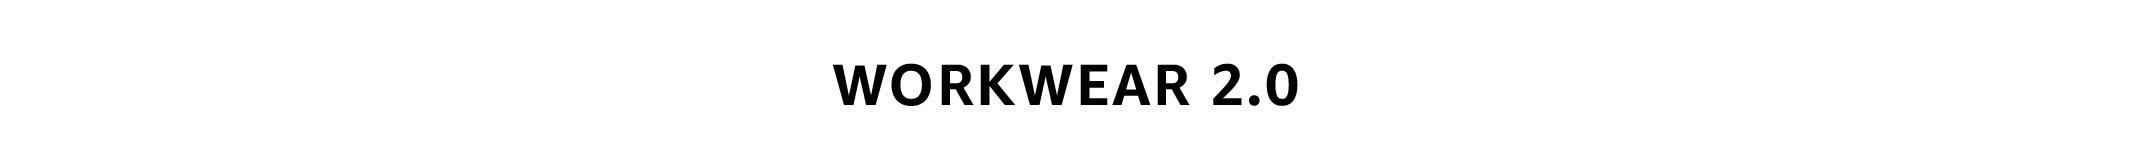 Workwear 2.0